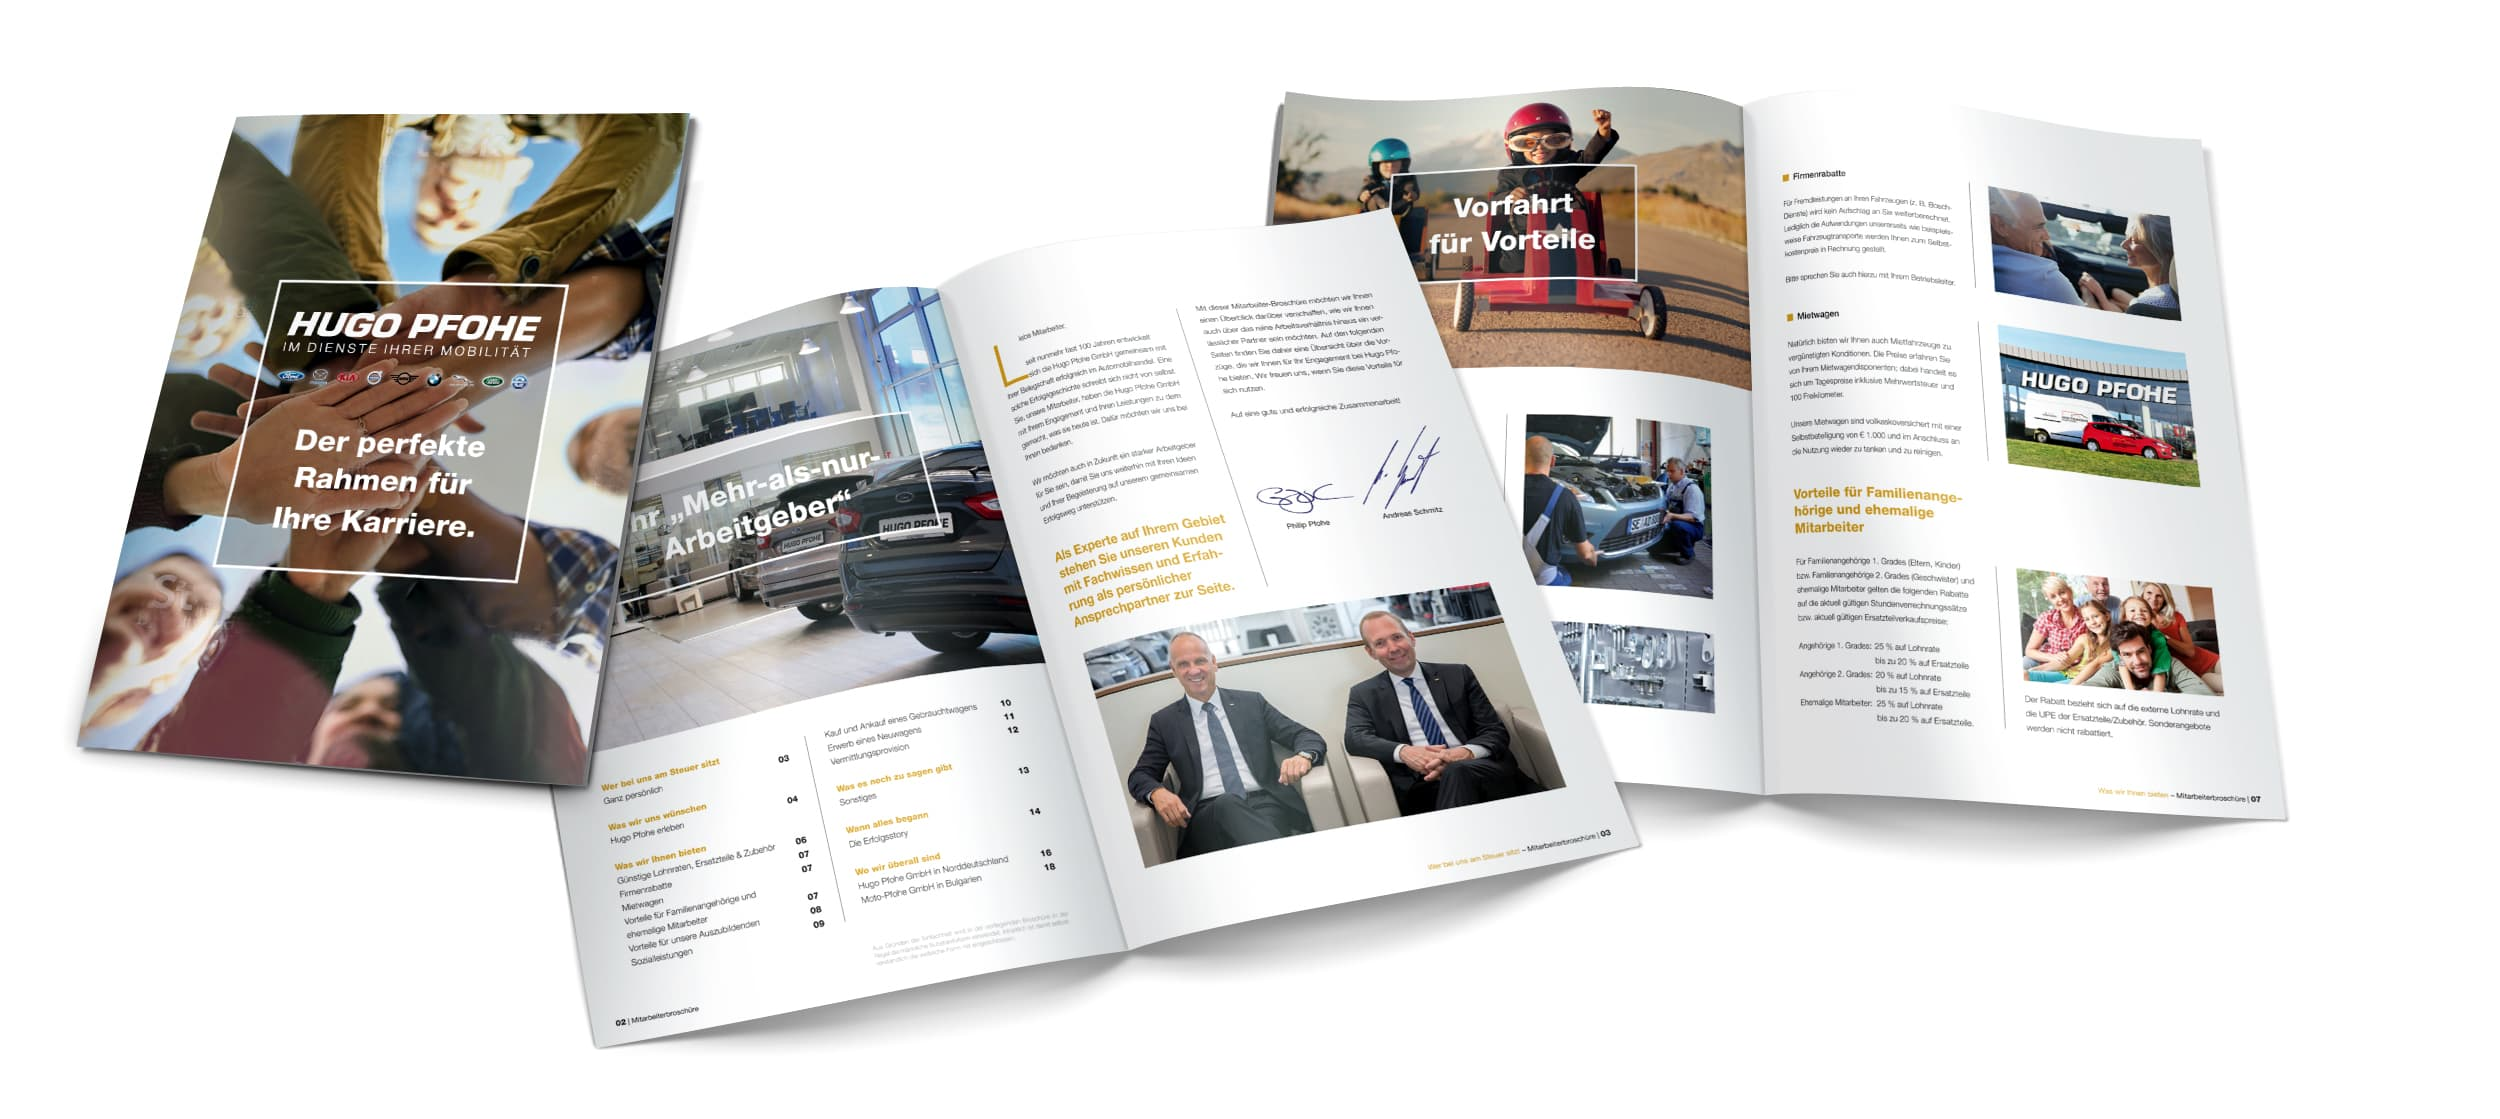 Rückemänner Werbeagentur Hamburg Mitarbeiter-Broschüre HugoPfohe